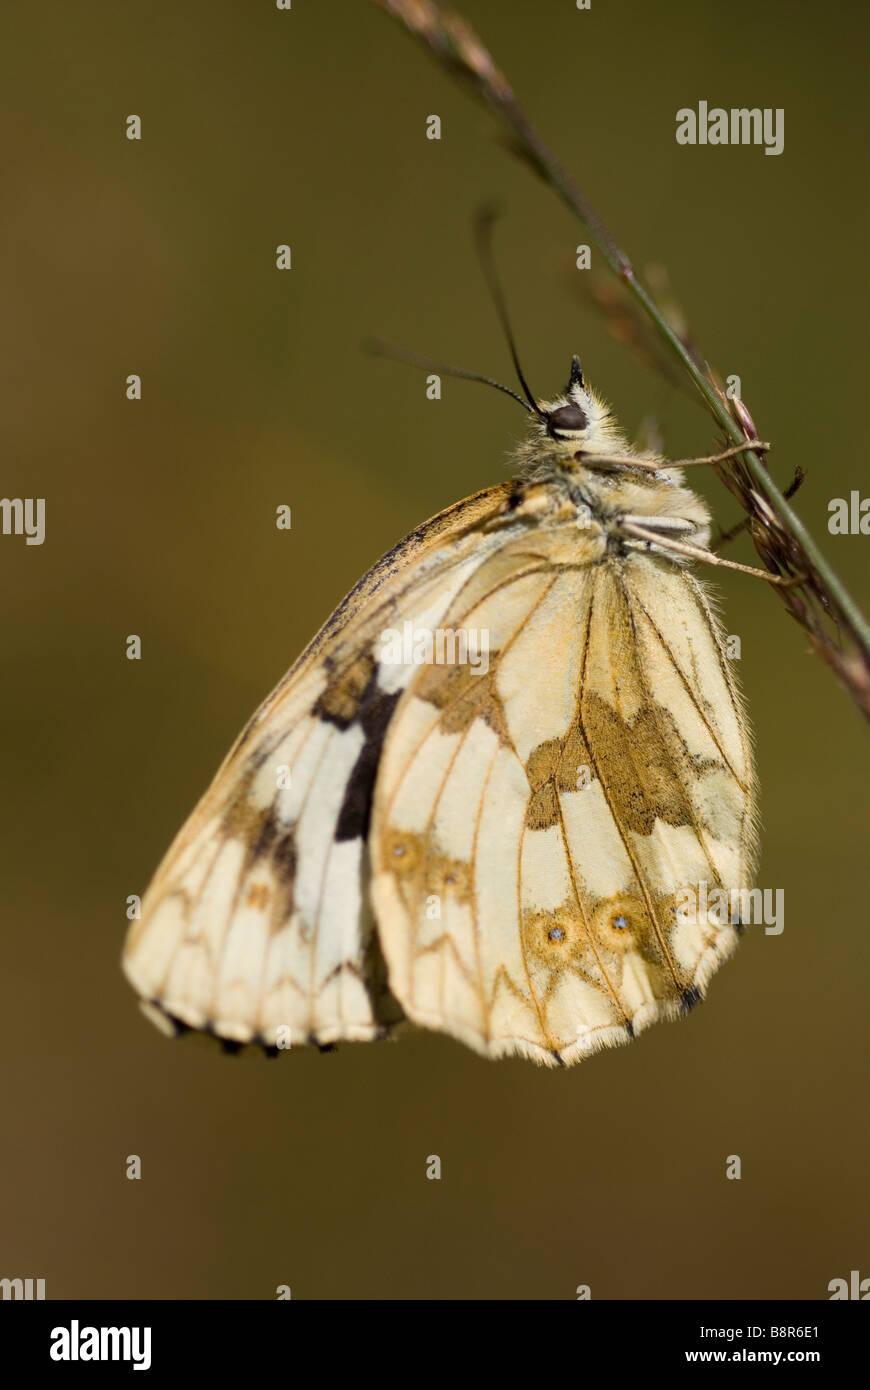 Female iberian marbled white butterfly (Melanargia lachesis) - Stock Image